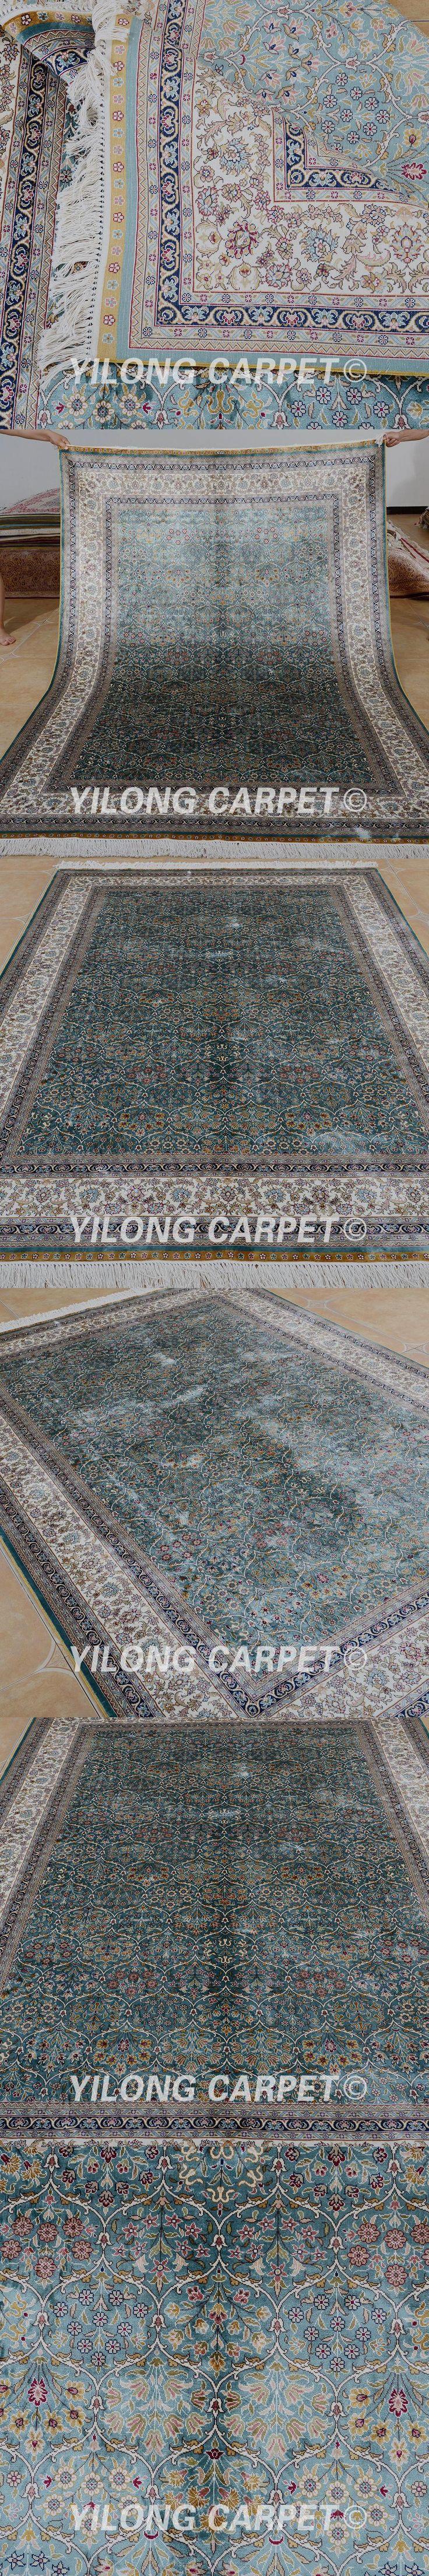 Best 25 carpet for sale ideas on pinterest colorado houses yilong 55x8 hereke carpet rectangle vantage blue turkish rugs for sale silk dailygadgetfo Choice Image